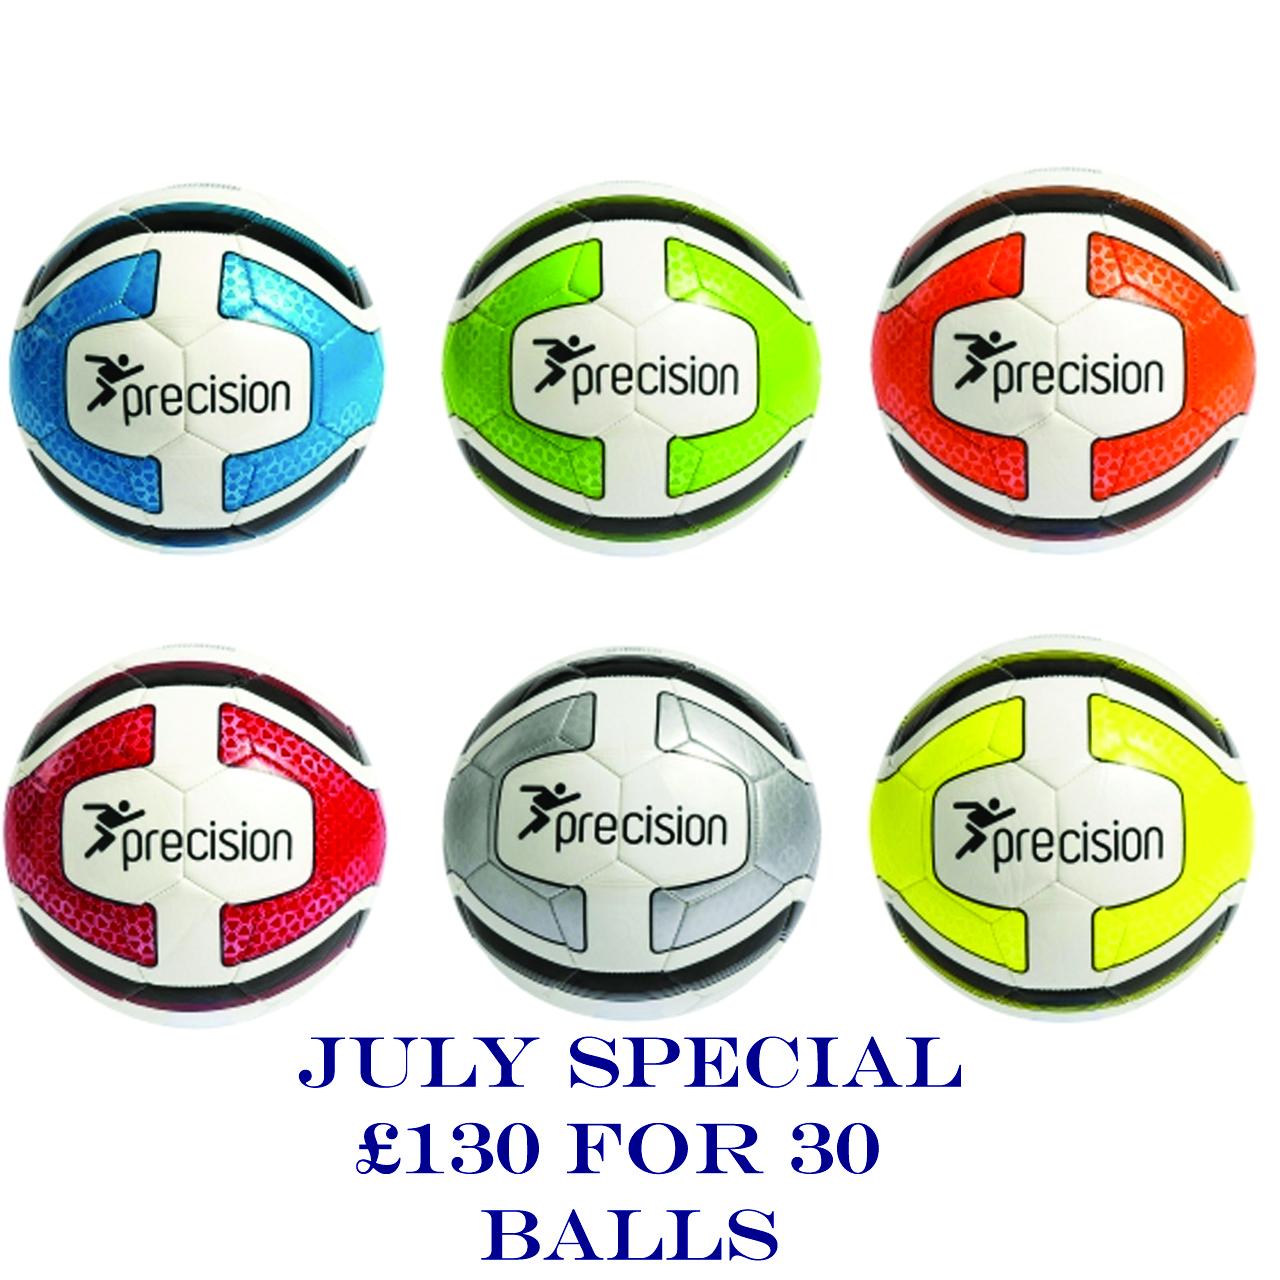 30 Ball Super Deal - Precision Santos